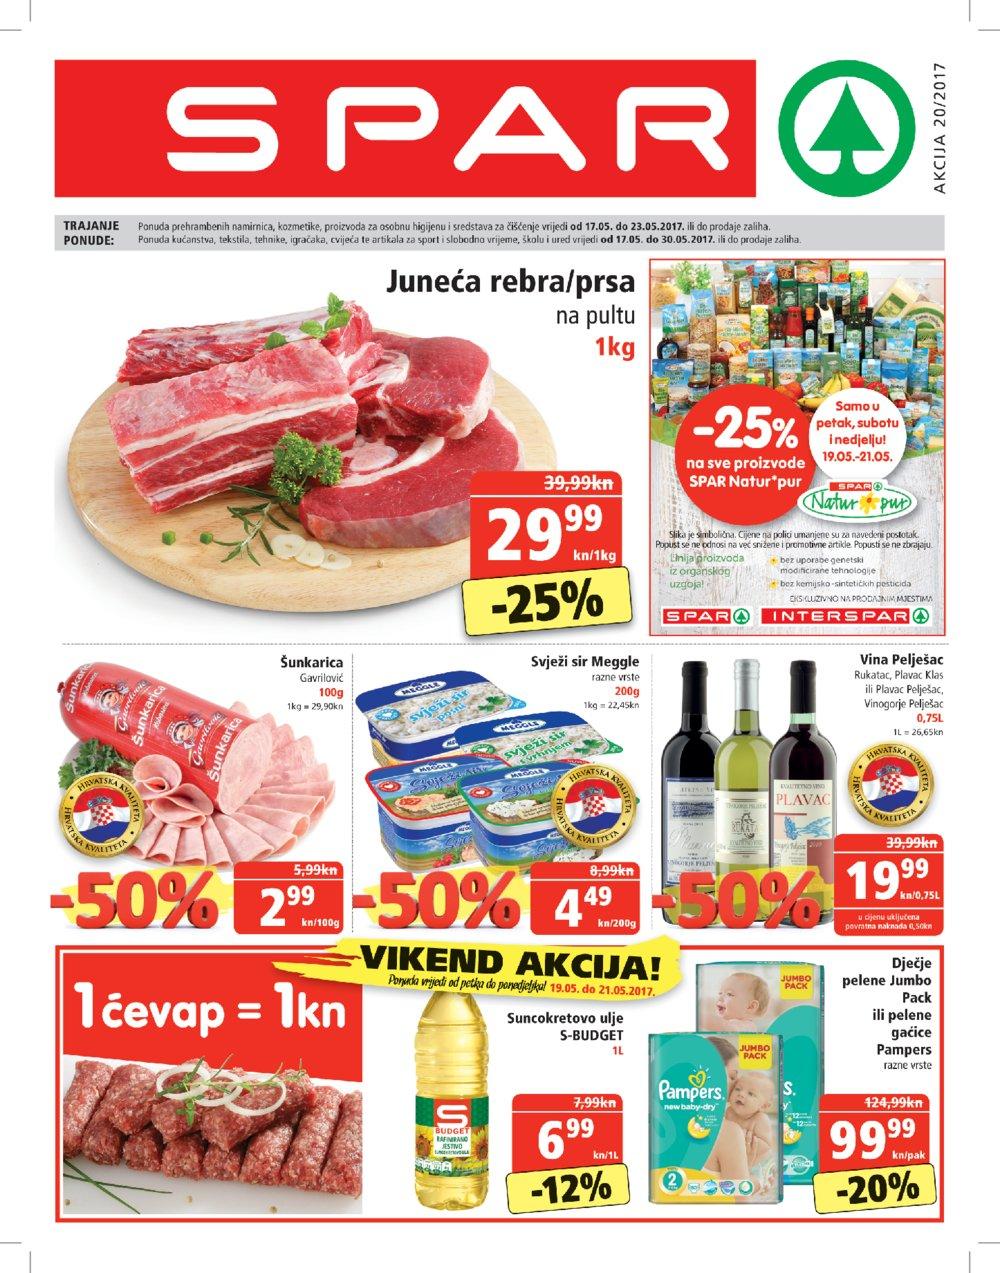 Spar Katalog akcija od 17.05. do 30.05.2017.